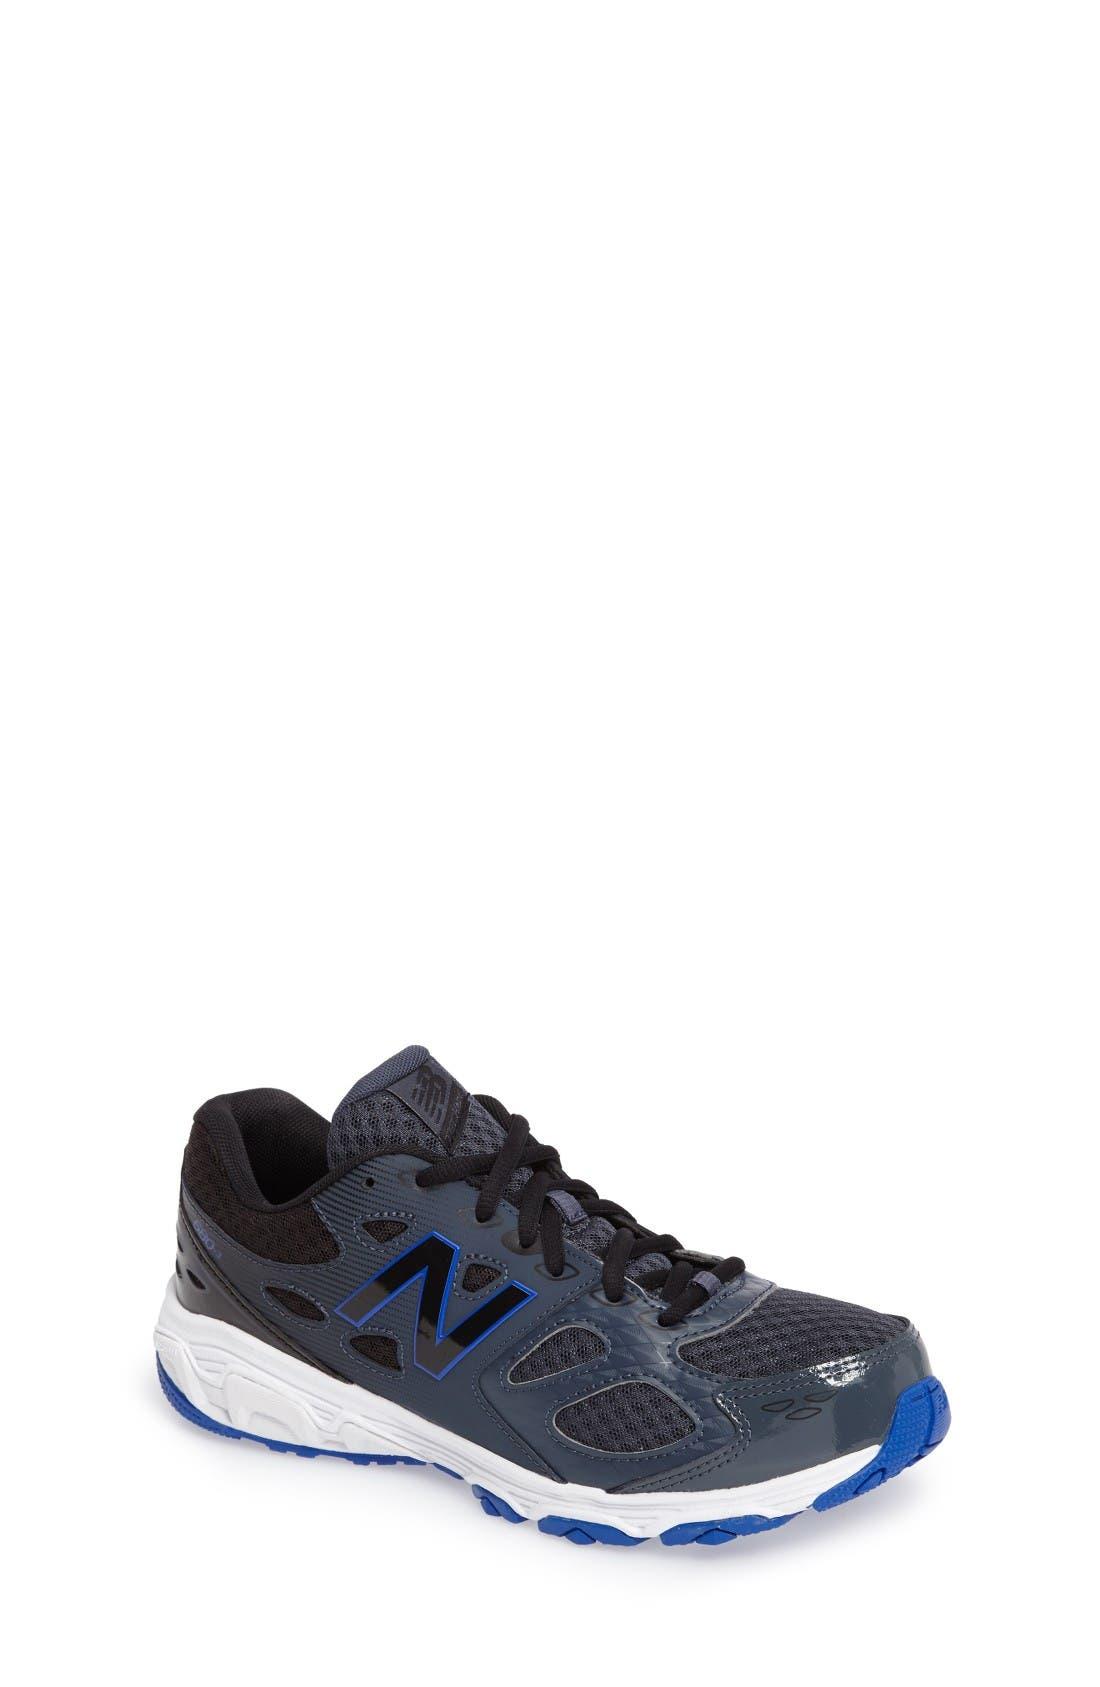 680v3 Sneaker,                             Main thumbnail 1, color,                             Grey/Blue